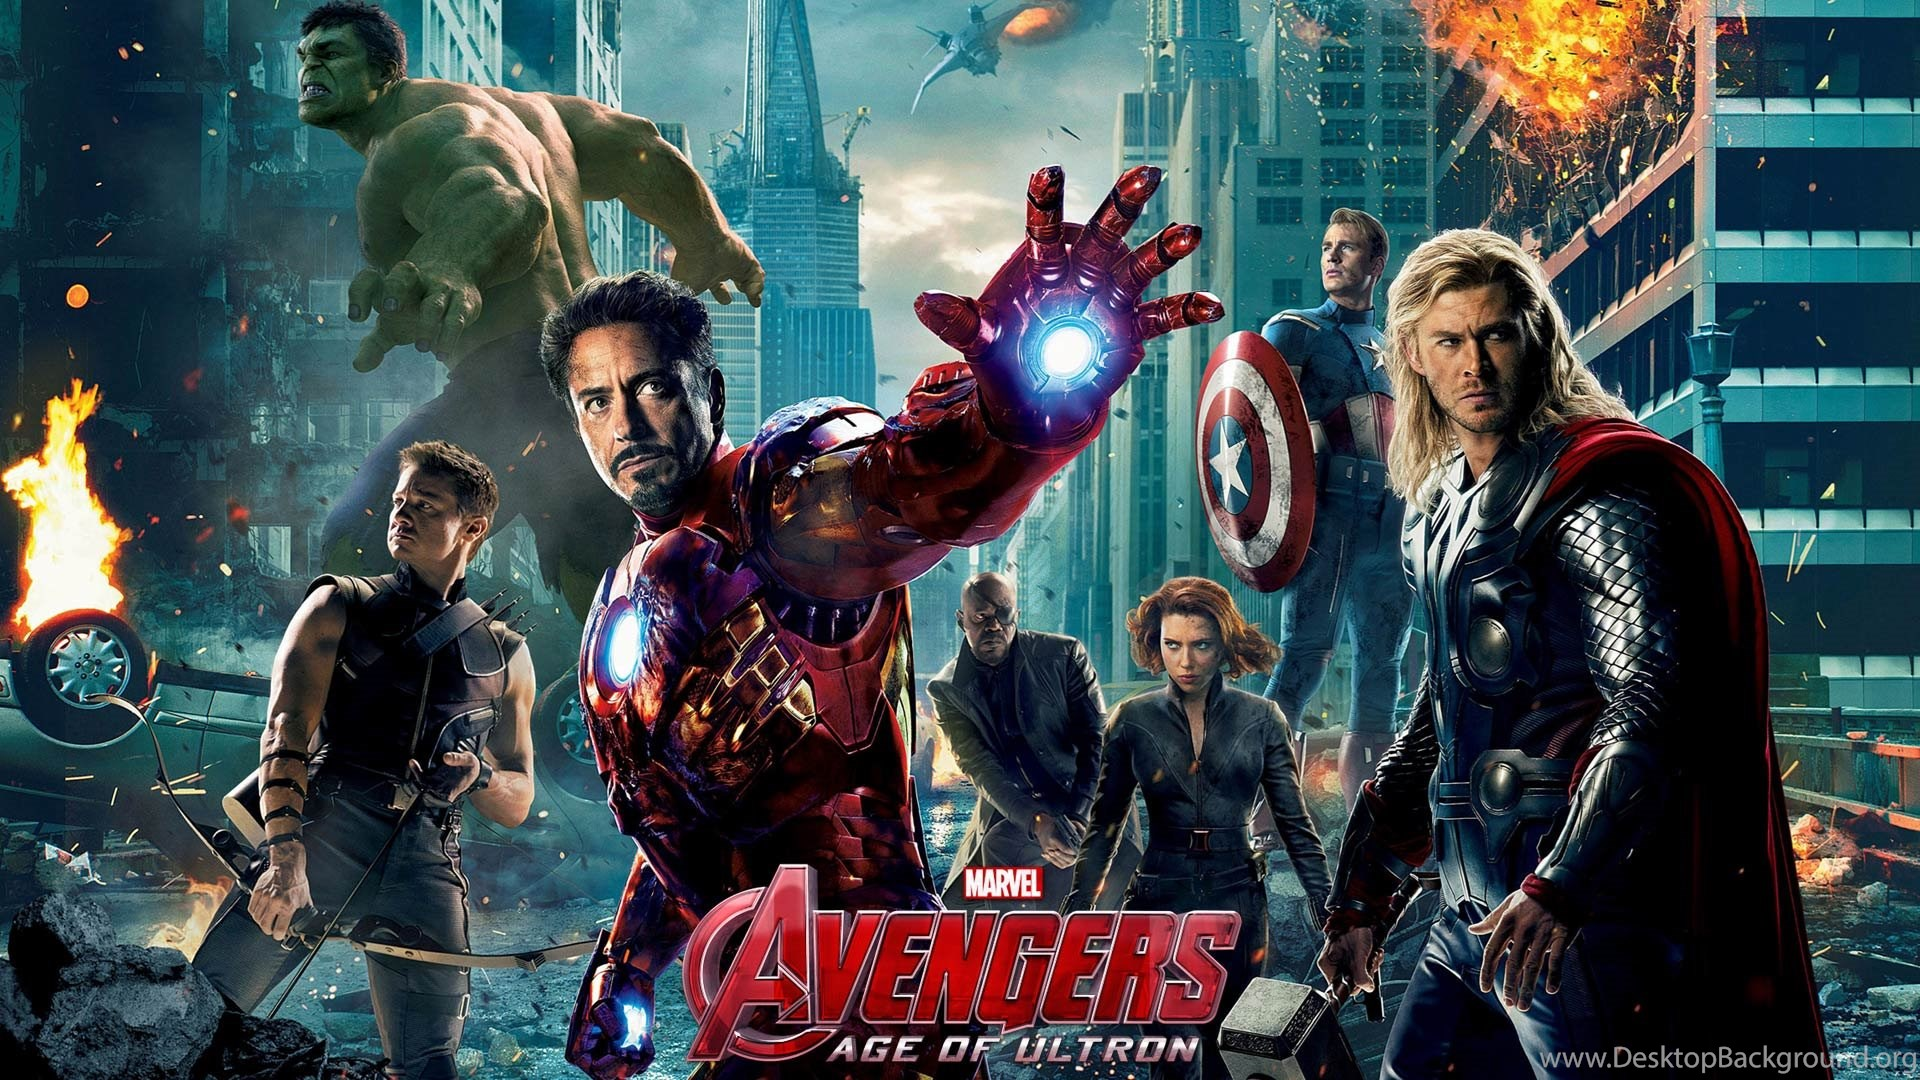 Avengers Age Of Ultron Wallpapers Hd 1080p For Desktop Desktop